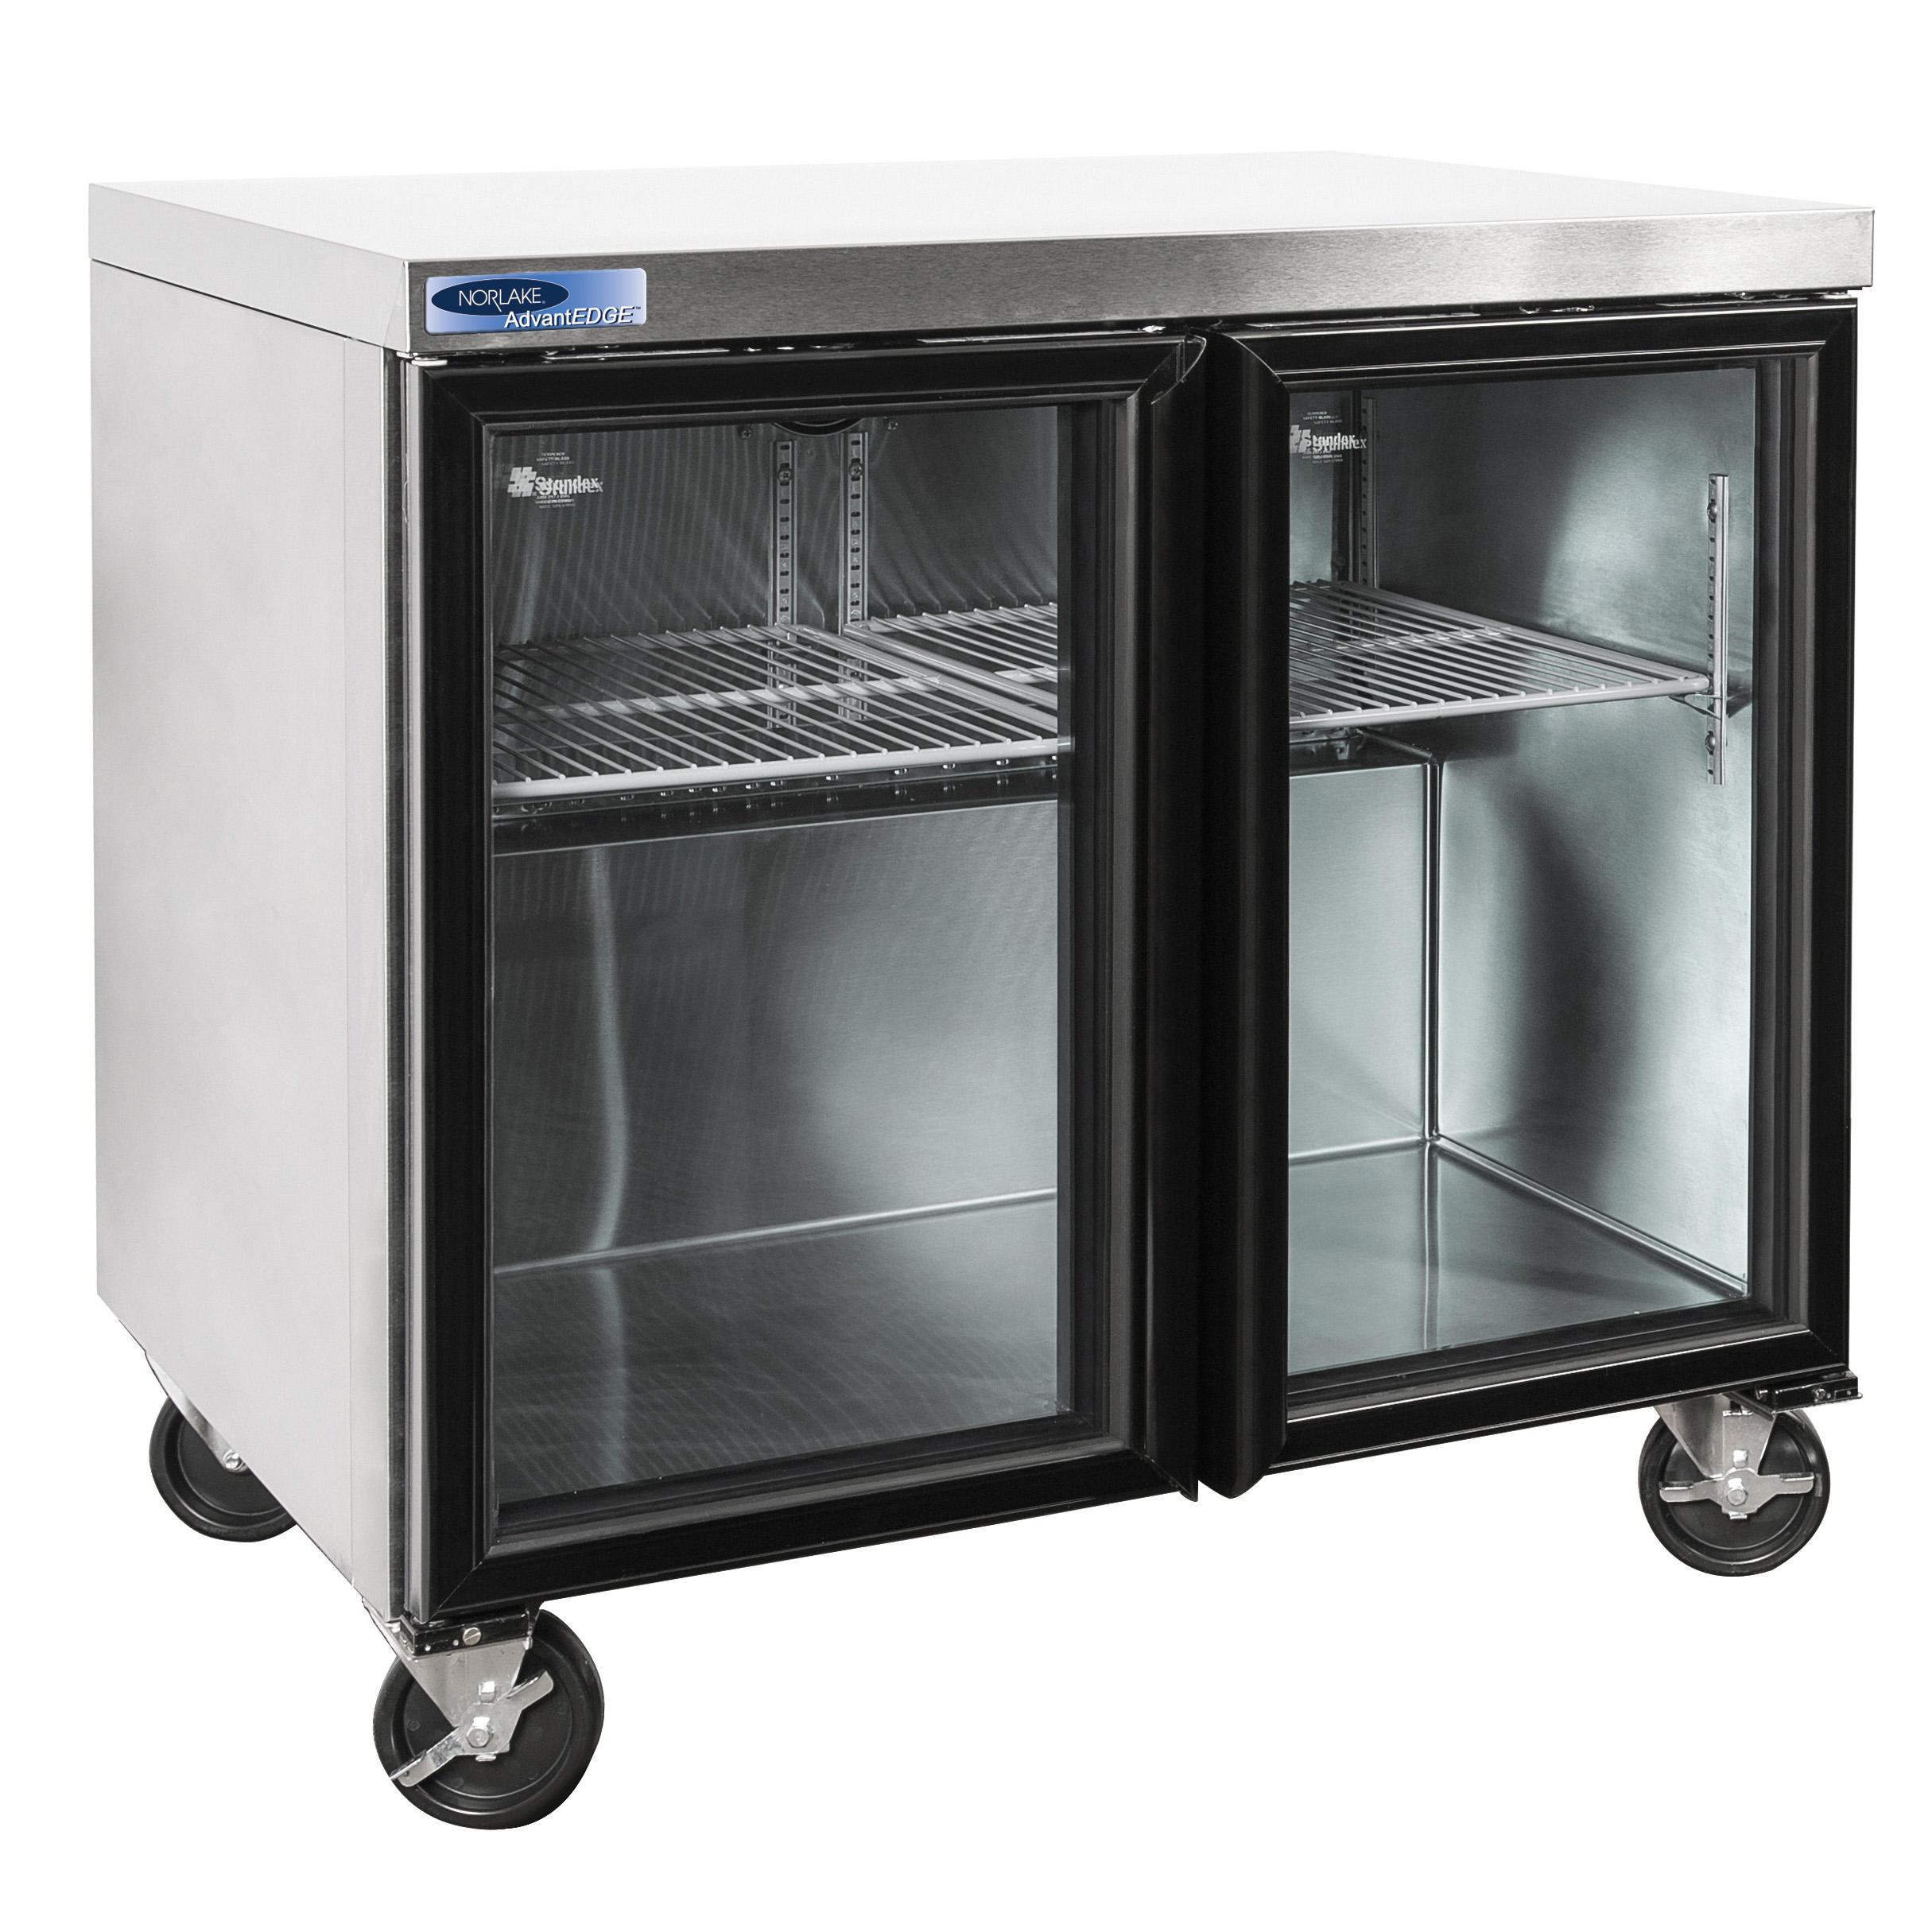 Nor-Lake NLURG36A-013 refrigerator, undercounter, reach-in